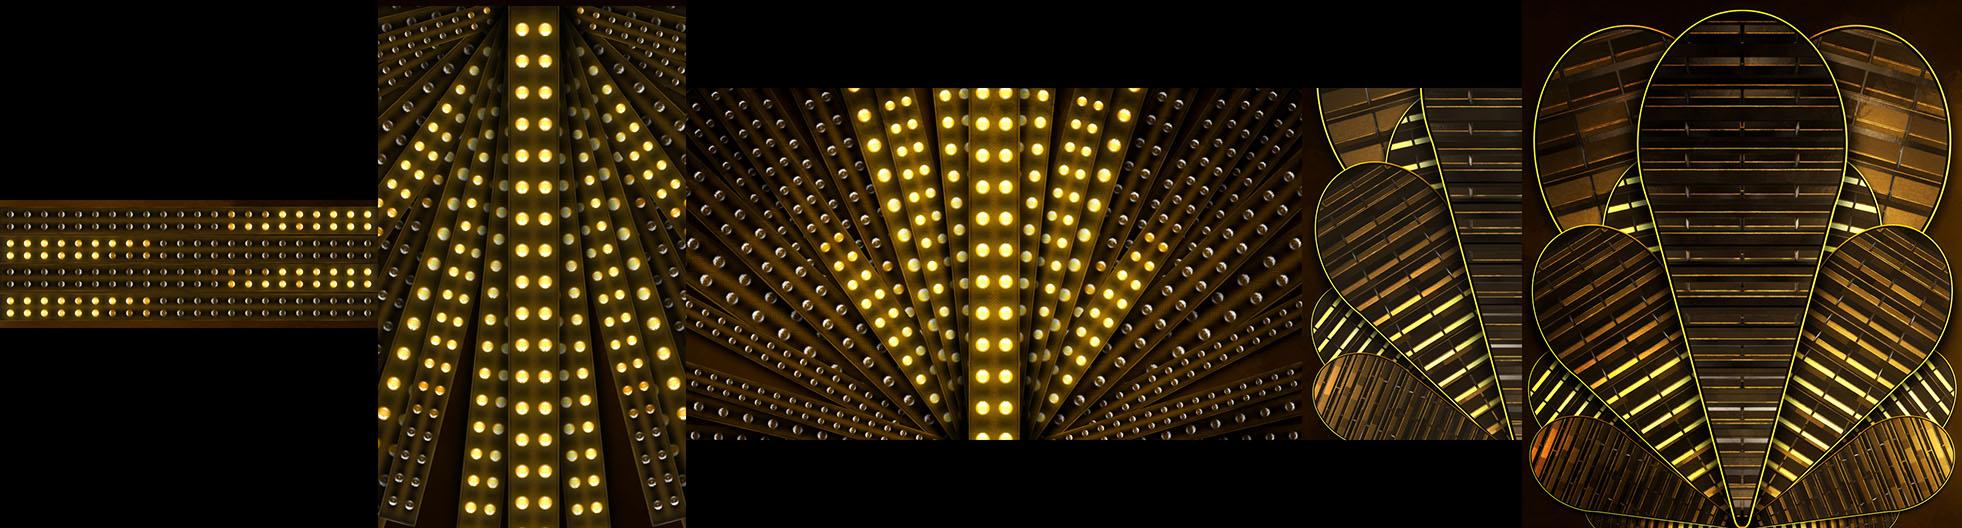 Lights - Got Talent Israel by Elad Magdasi